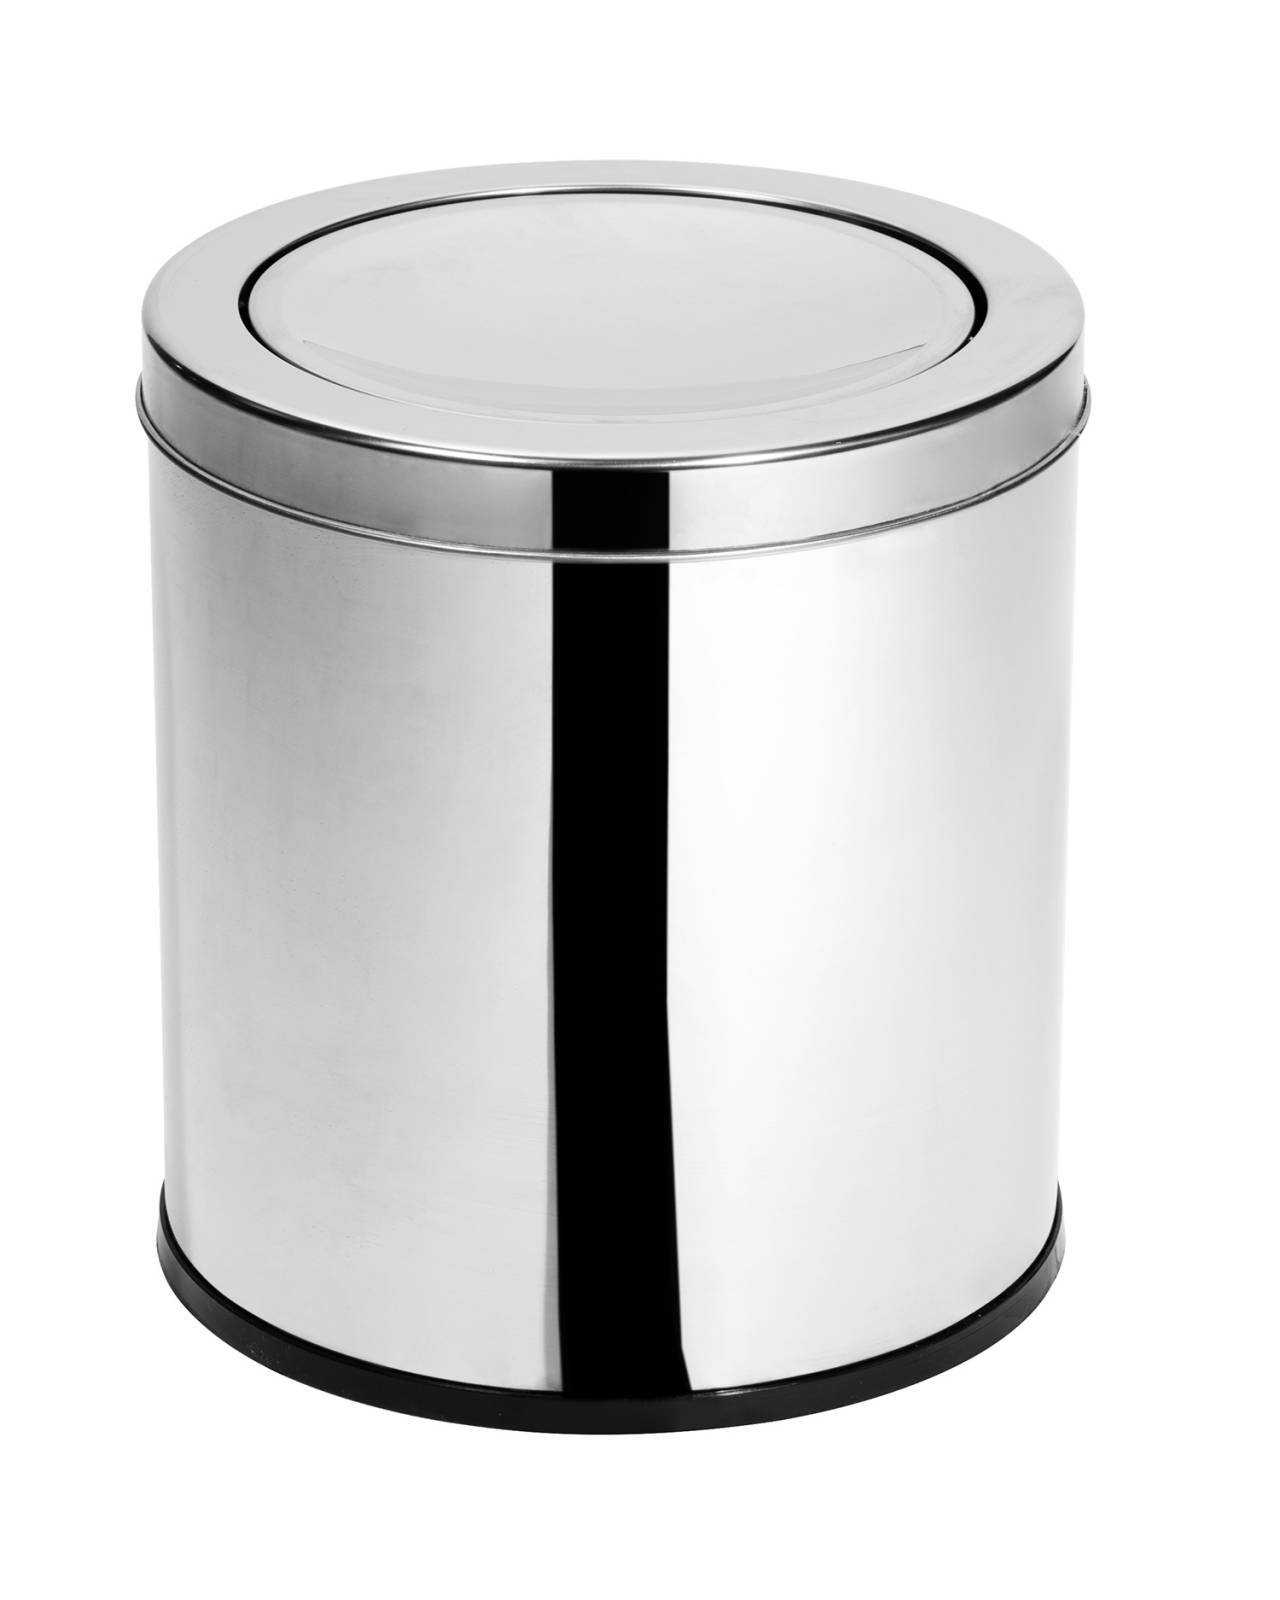 Lixeira Inox c/ tampa Basculante 12,7 - Litros Elegance